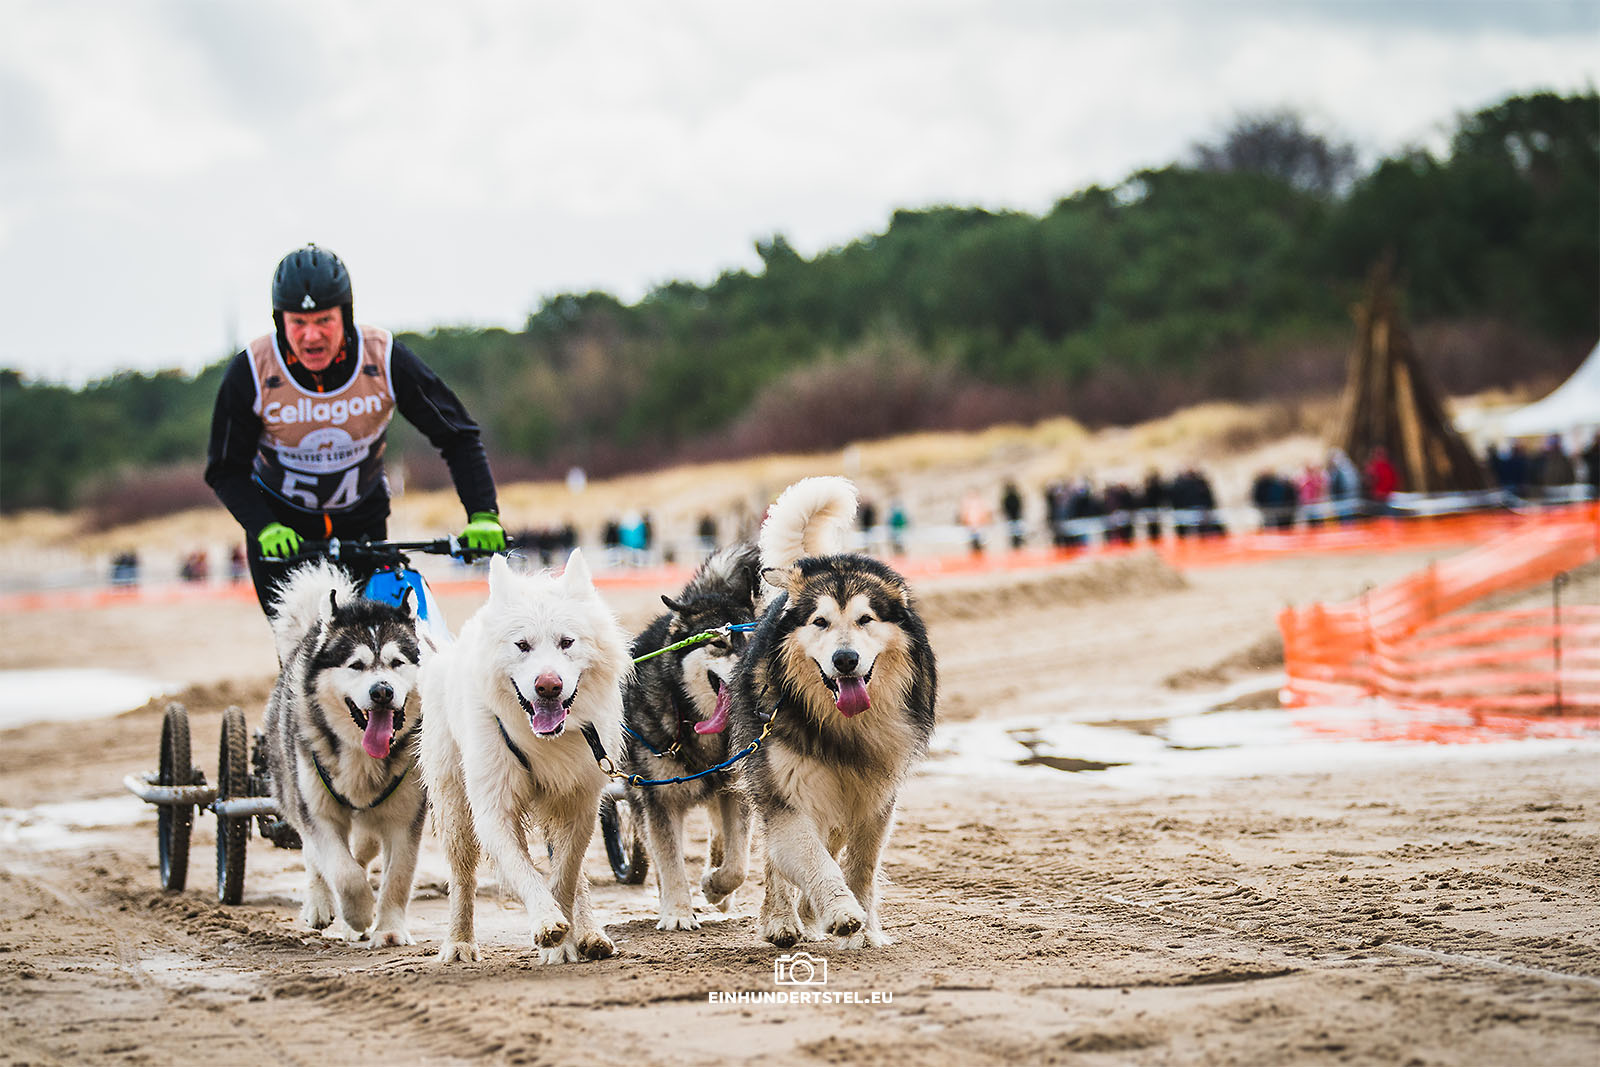 Schlittenhundewagen beim Baltic Lights Fest am Strand.